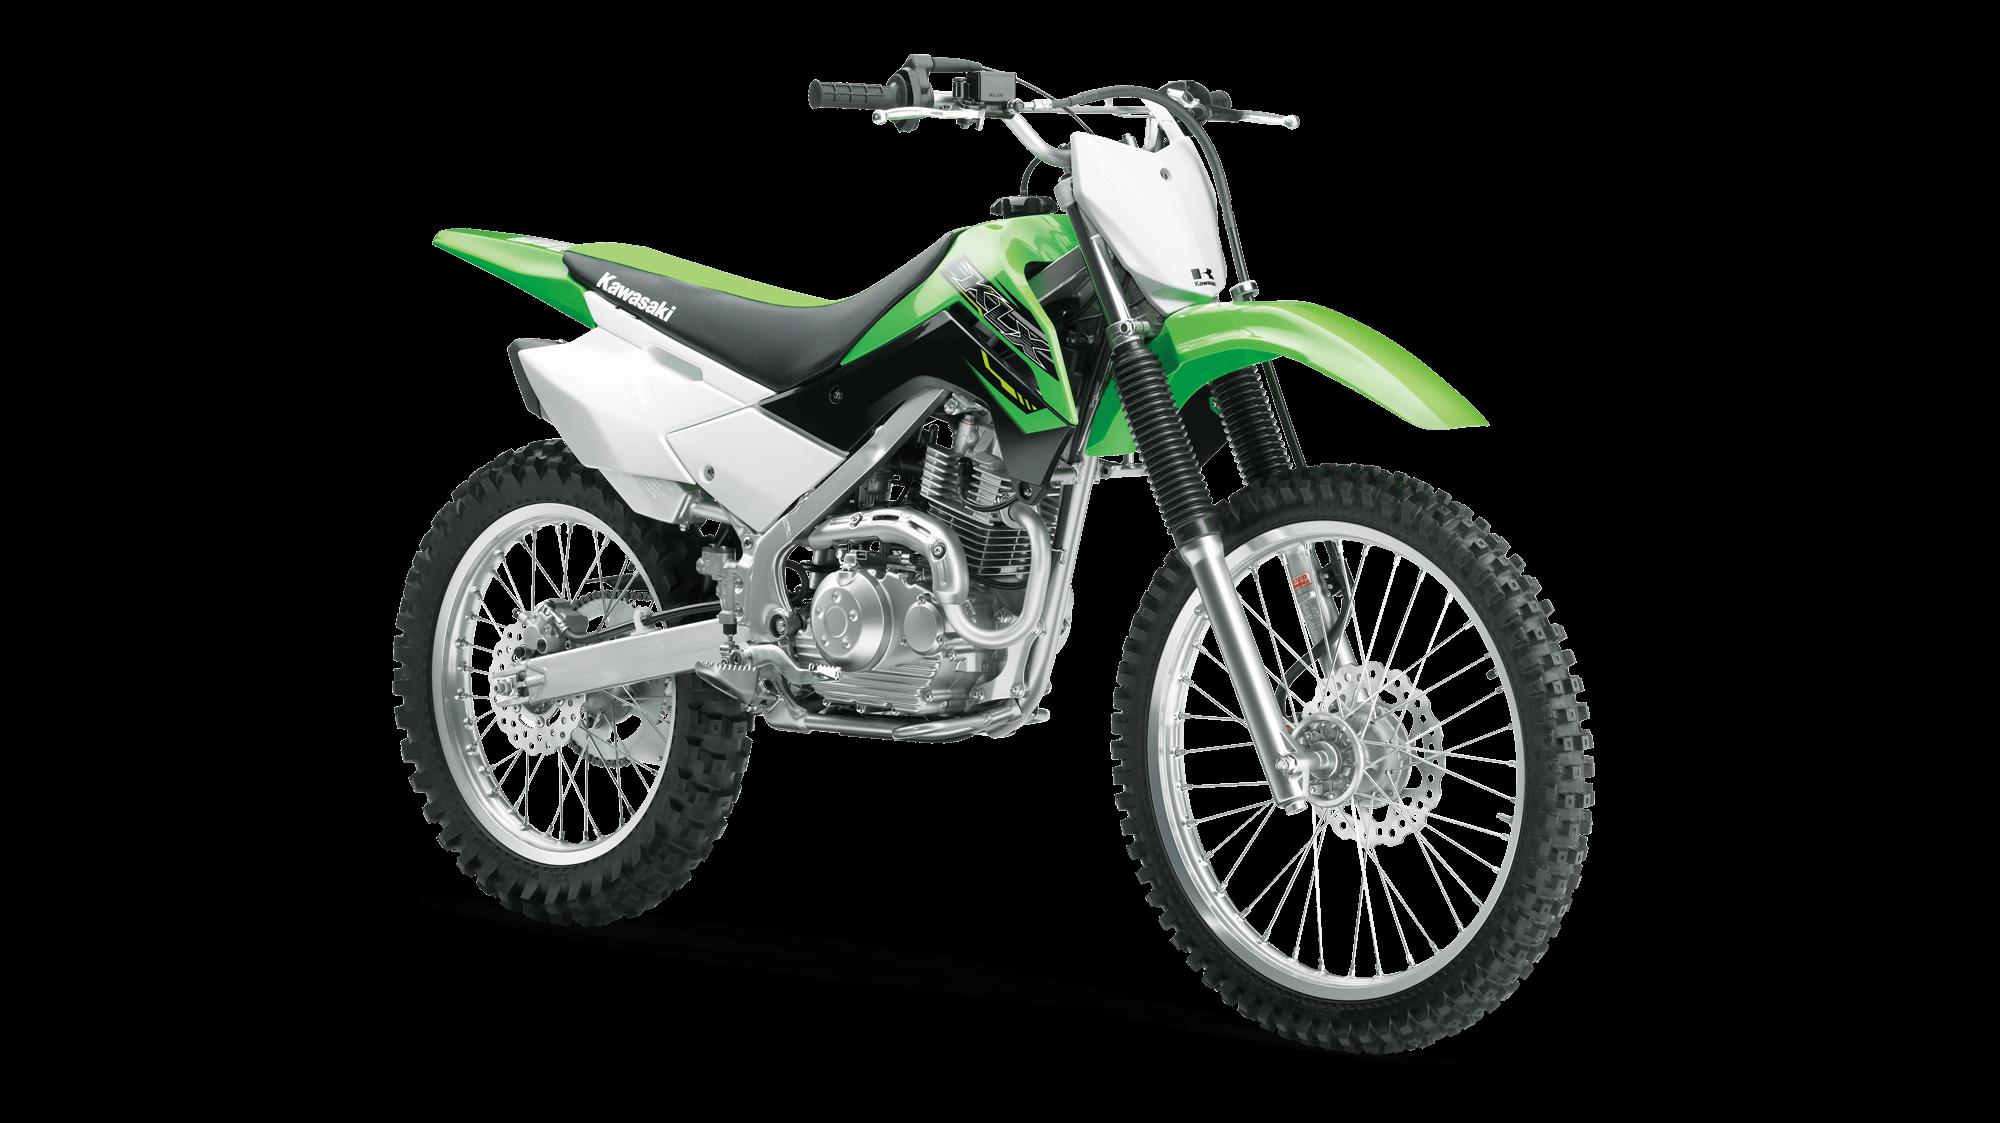 2019 KLX®140G KLR™/KLX® Motorcycle by Kawasaki